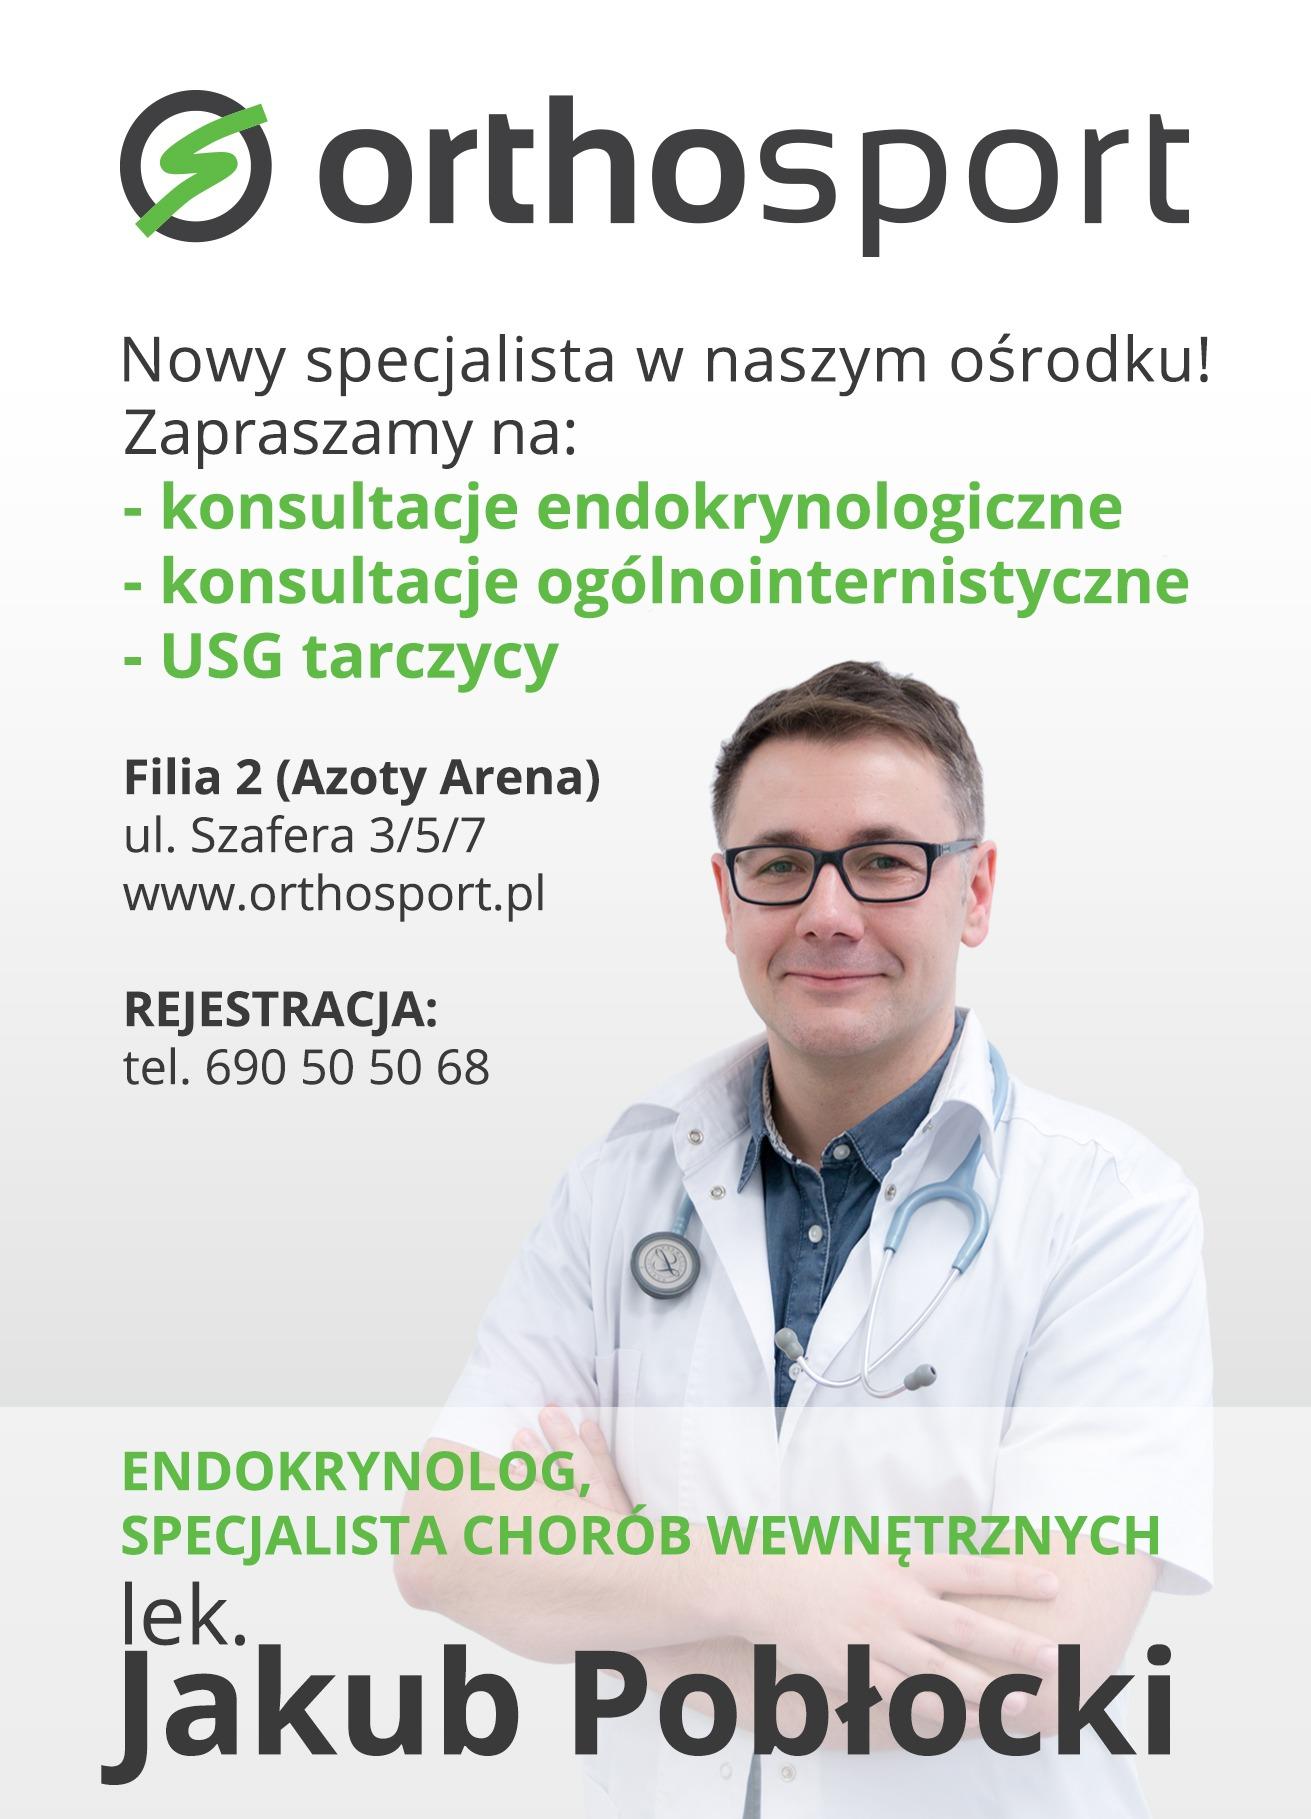 endokrynolog_reklama